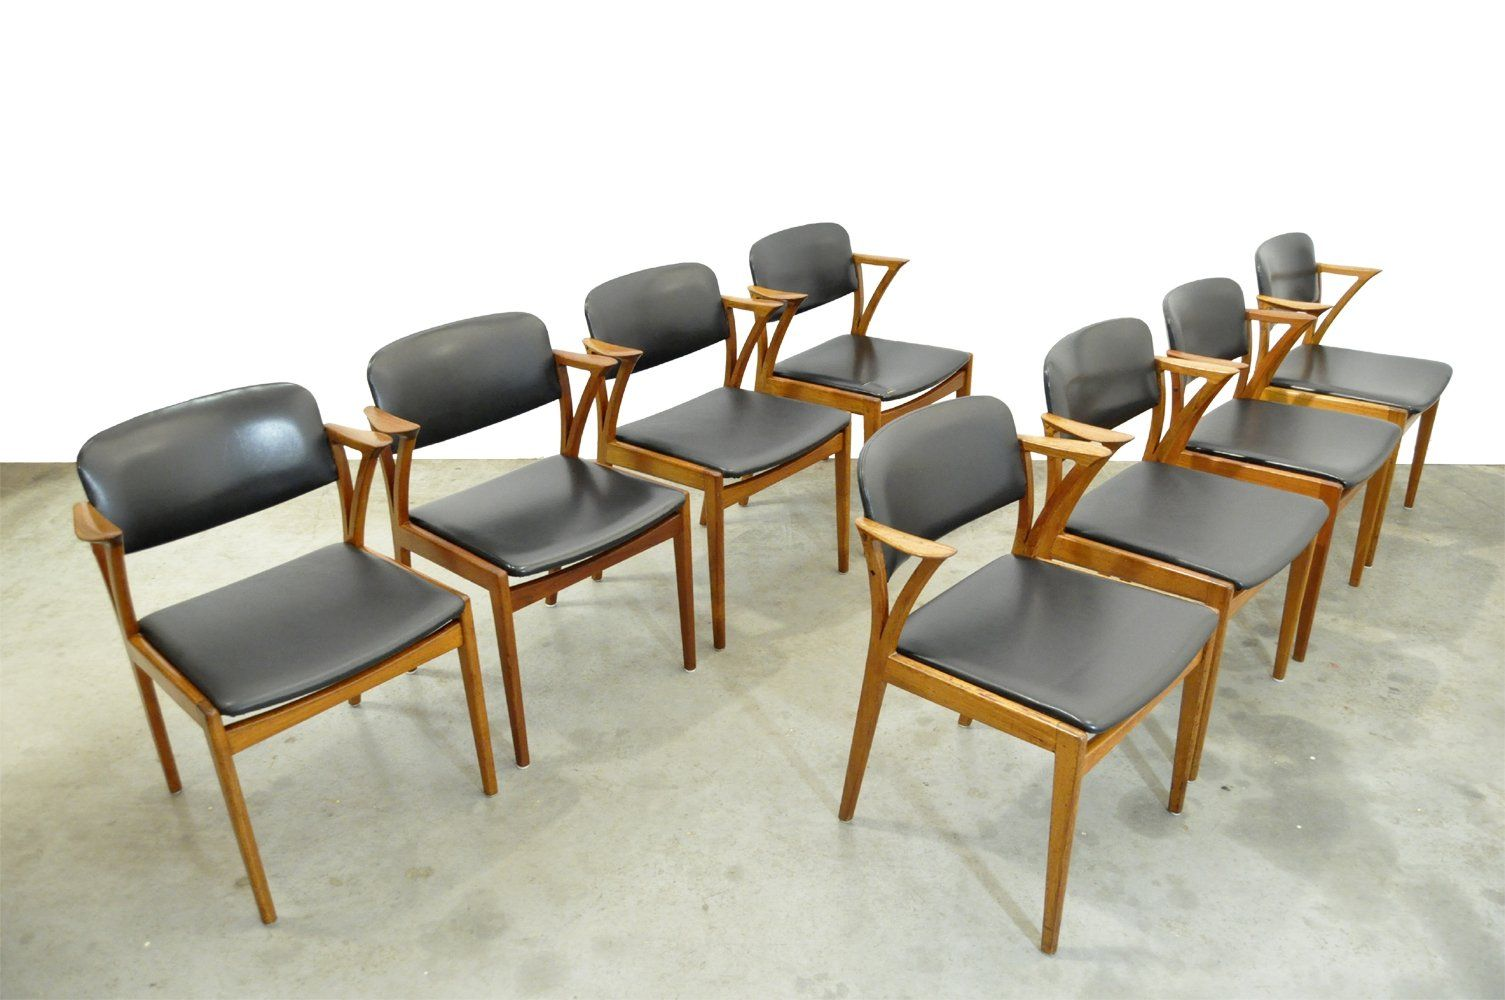 For Sale Set Of 8 Vintage Teak Dining Chairs By Kai Kristiansen For Bovenkamp 1960s